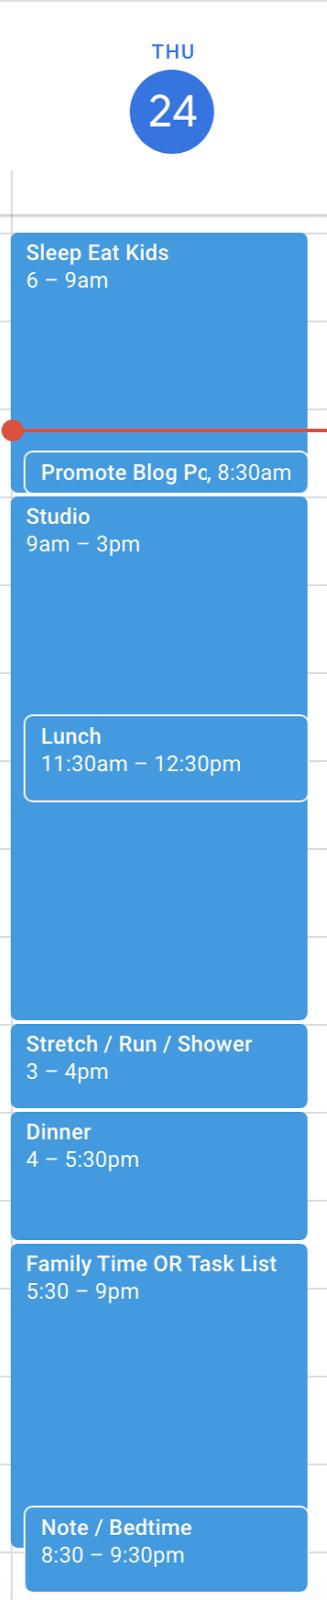 Graham Sedam, blog, thoughts, life, interests, writing, Google Calendar, Time Blocking, Batching, Tim Ferriss, Cal Newport, efficiency, productivity, time management, priorities, goals